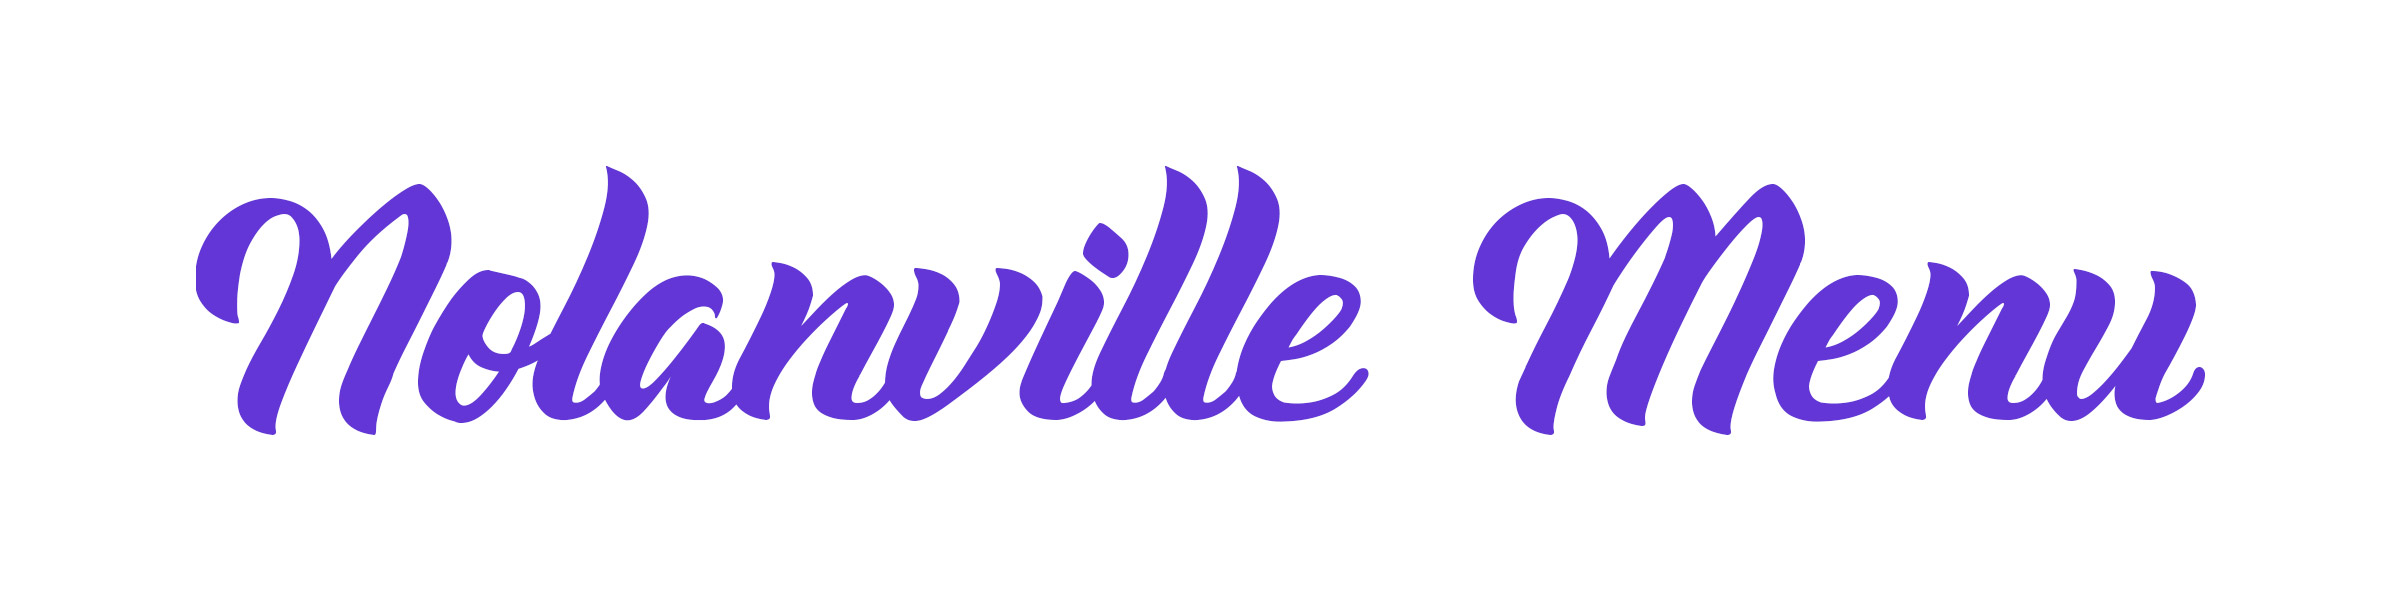 Nolanville-Menu.jpg